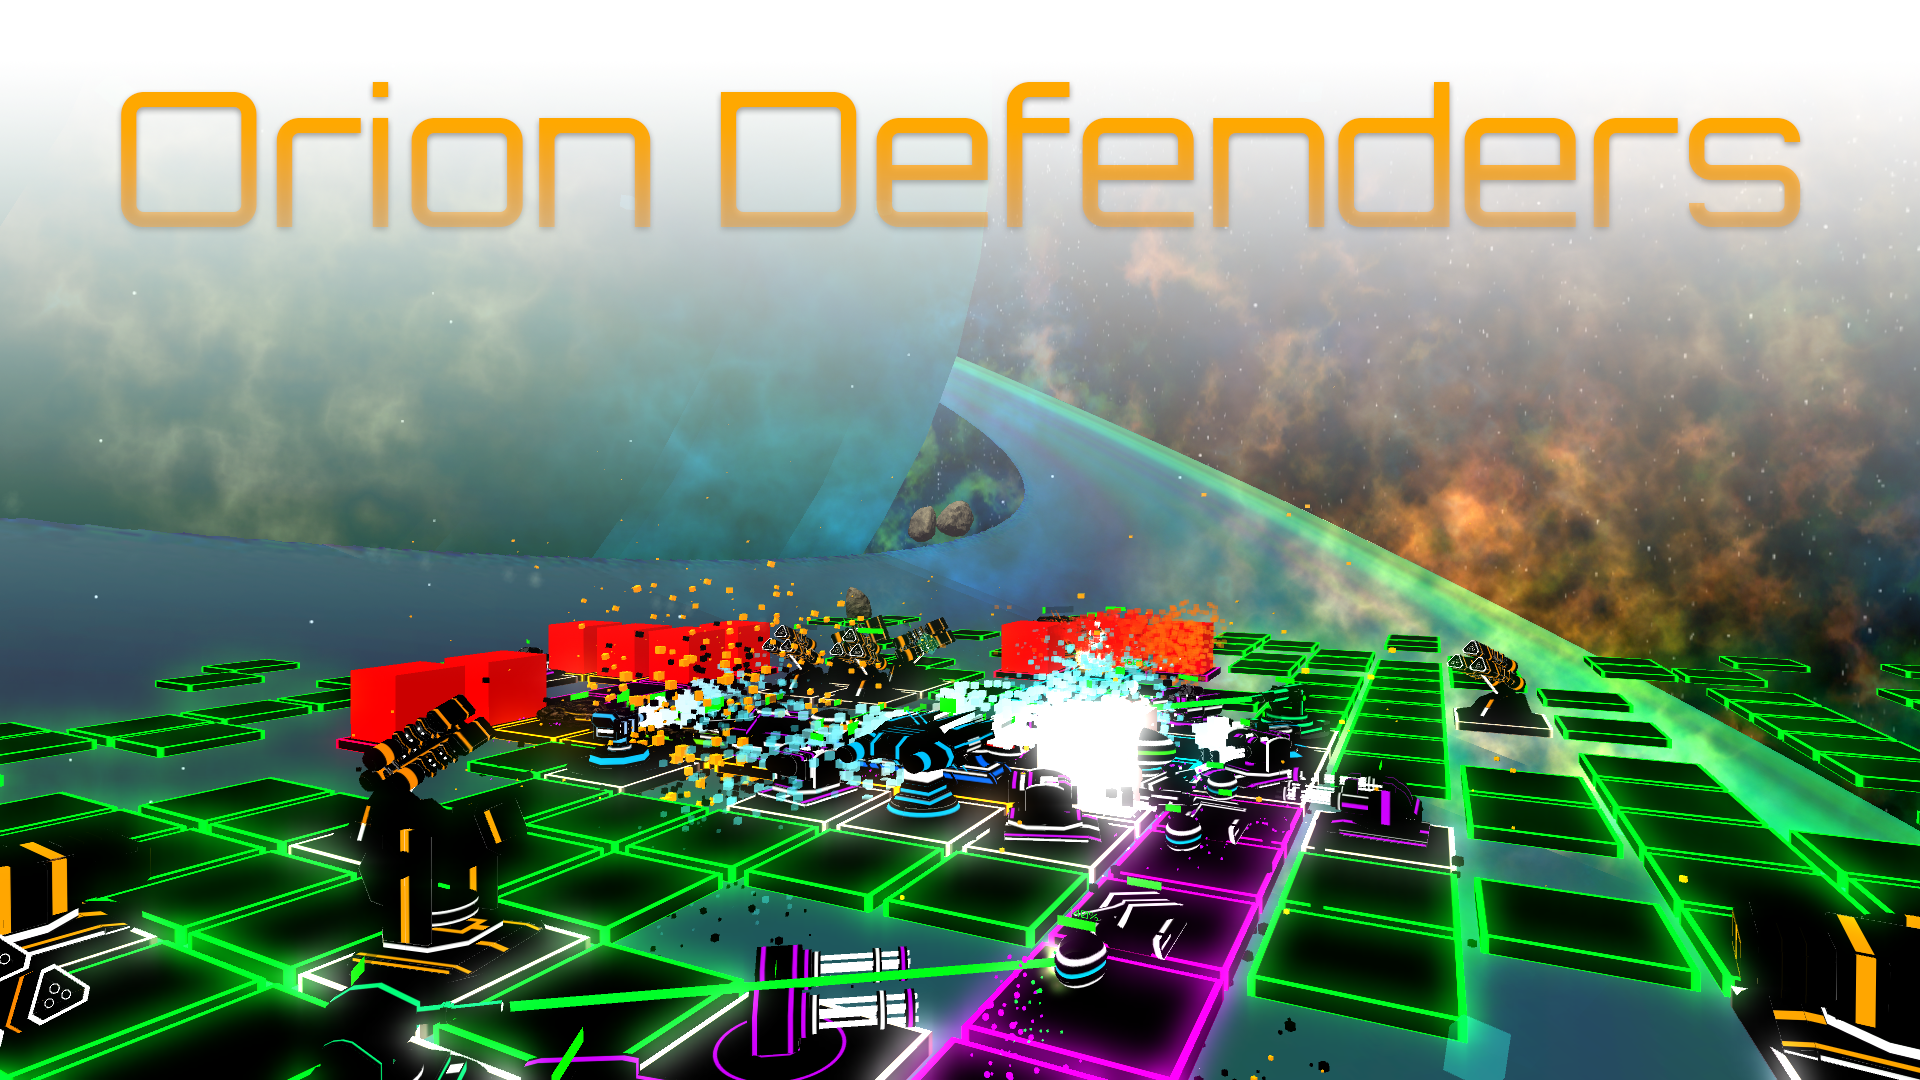 Orion Defenders